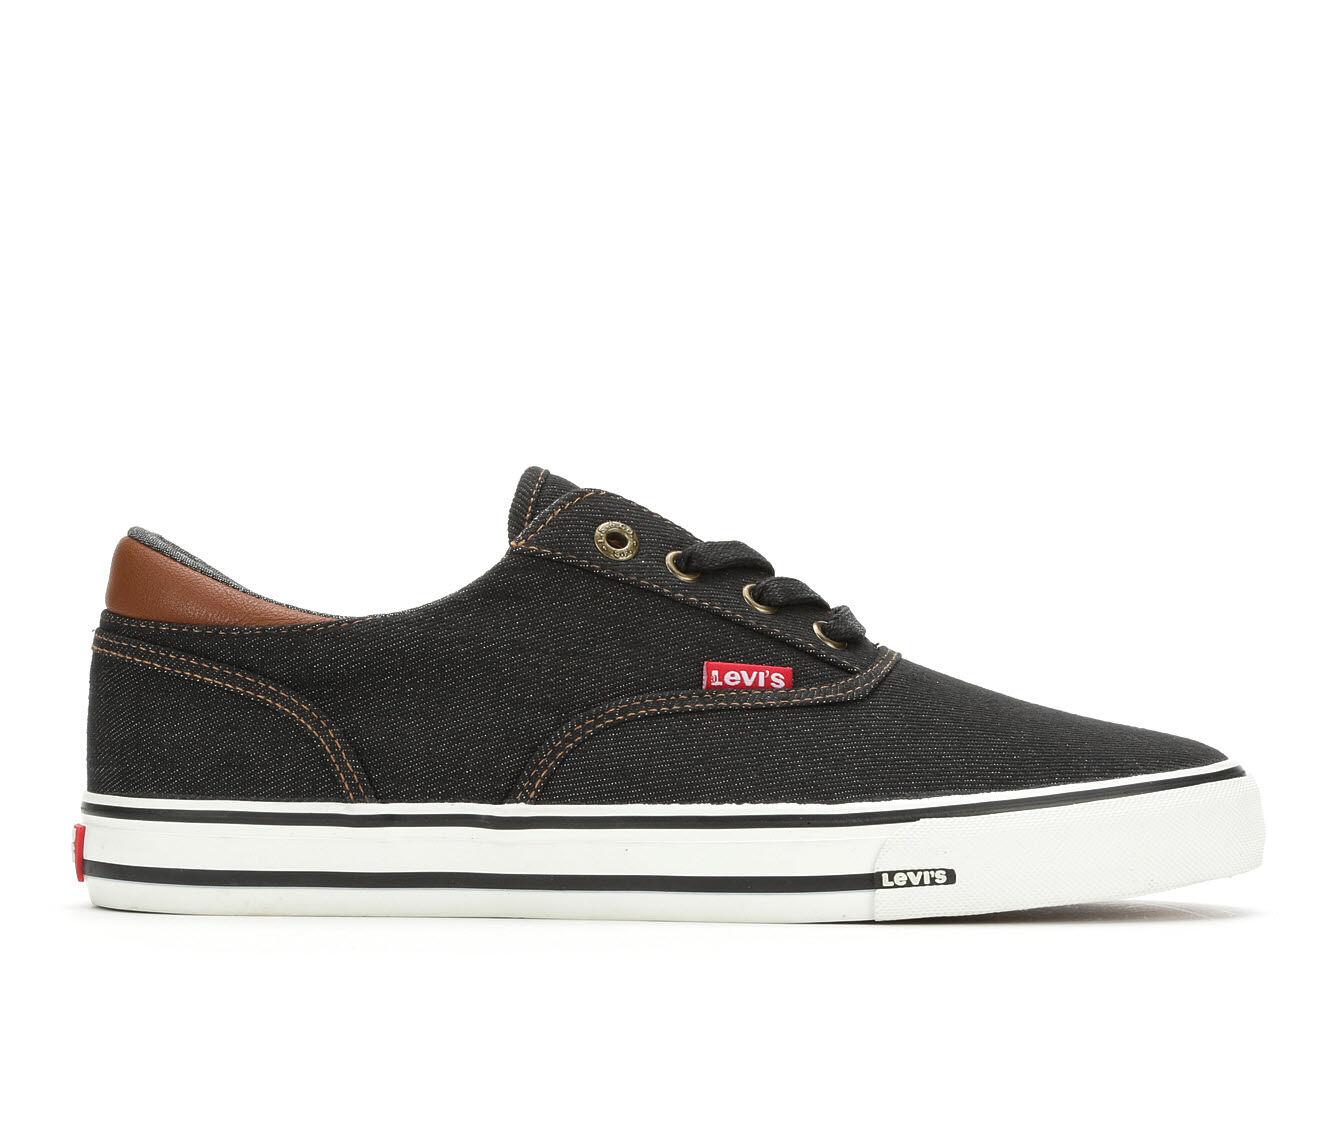 uk shoes_kd2160